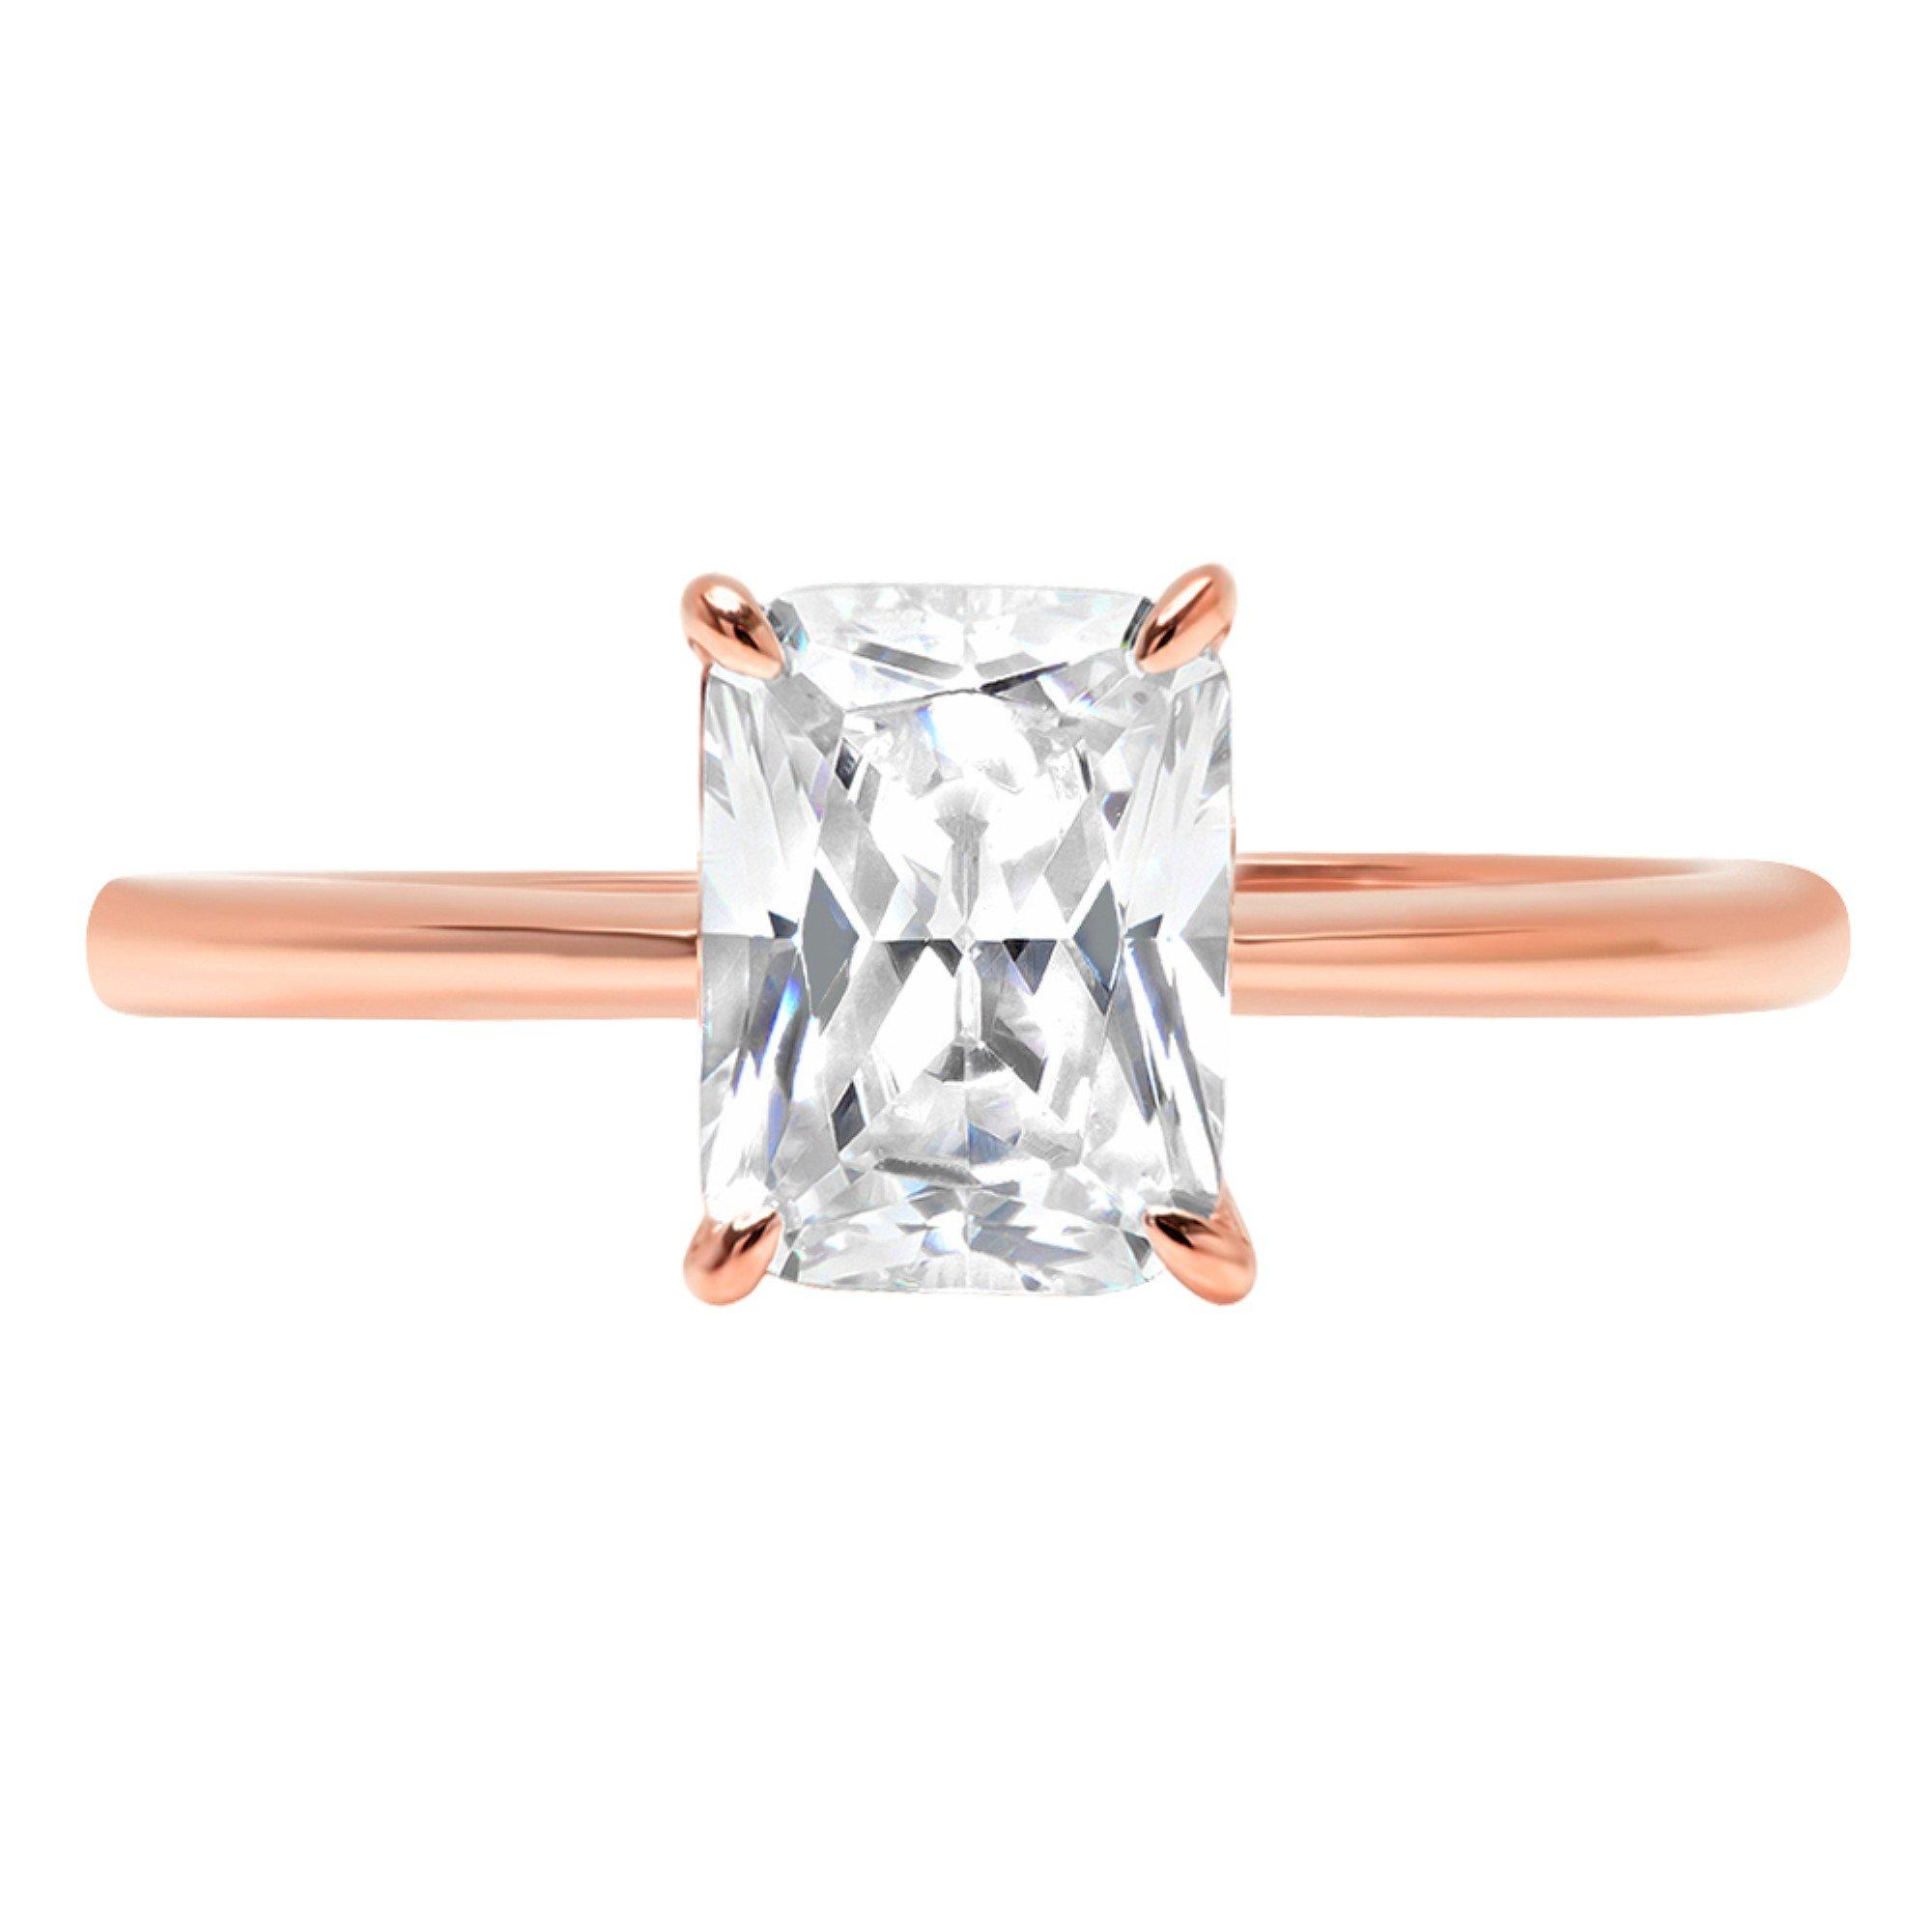 14k Rose Gold 0.8ct RadiantBrilliant Cut Classic Solitaire Designer Wedding Bridal Statement Anniversary Engagement Promise Ring Solid, 7.25